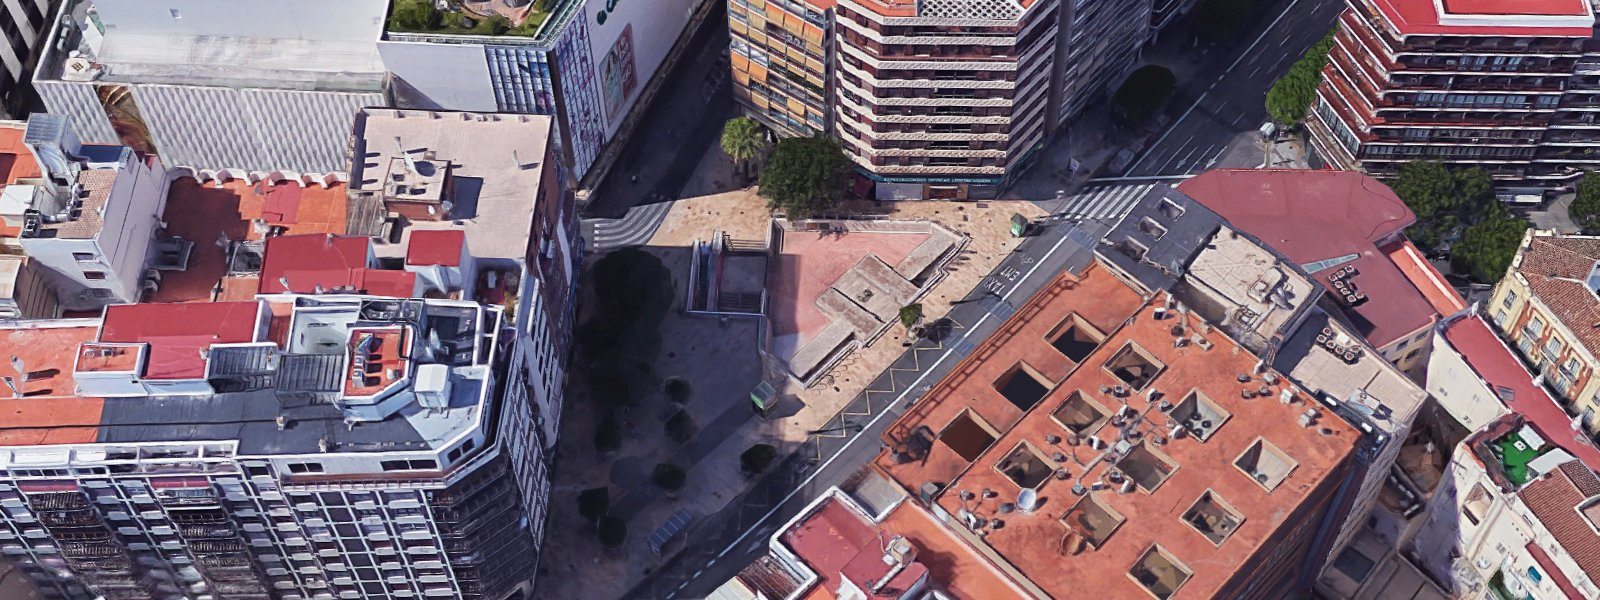 Plaça Pinazo, venue for shows representation